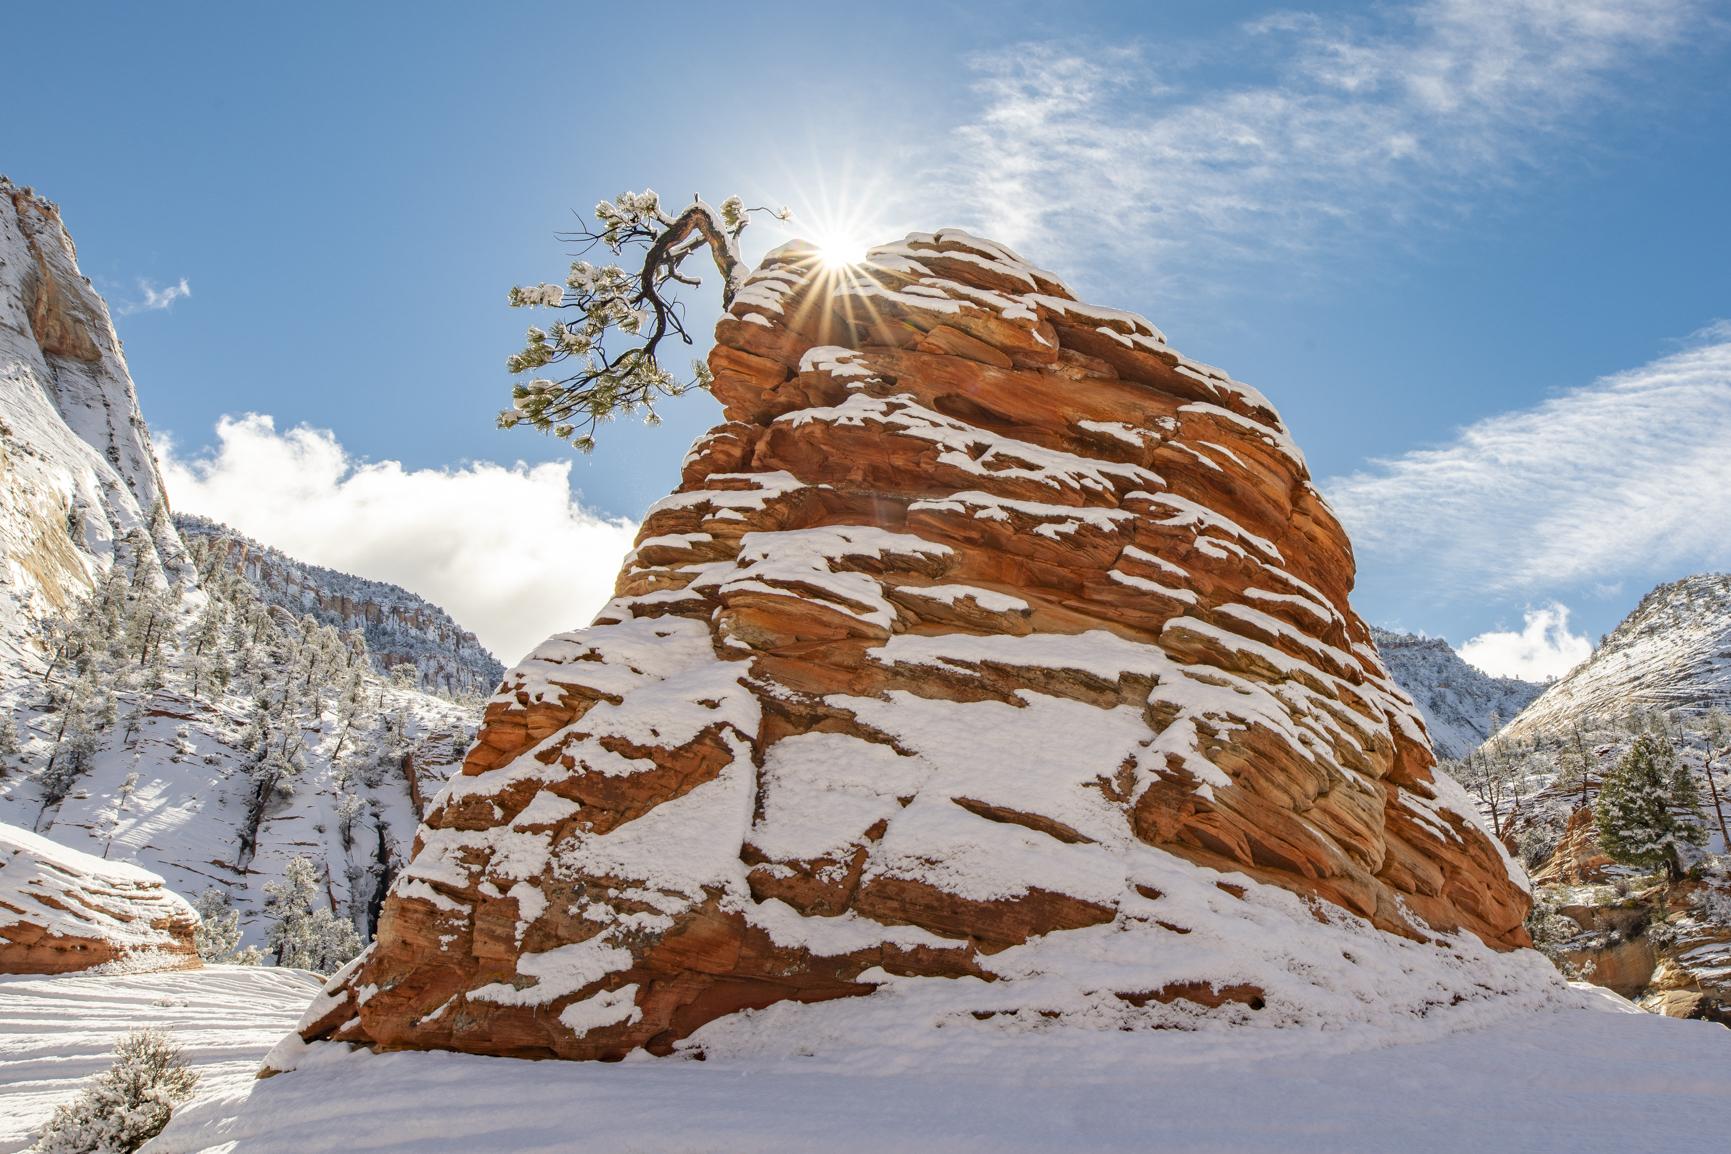 Zion winter photo